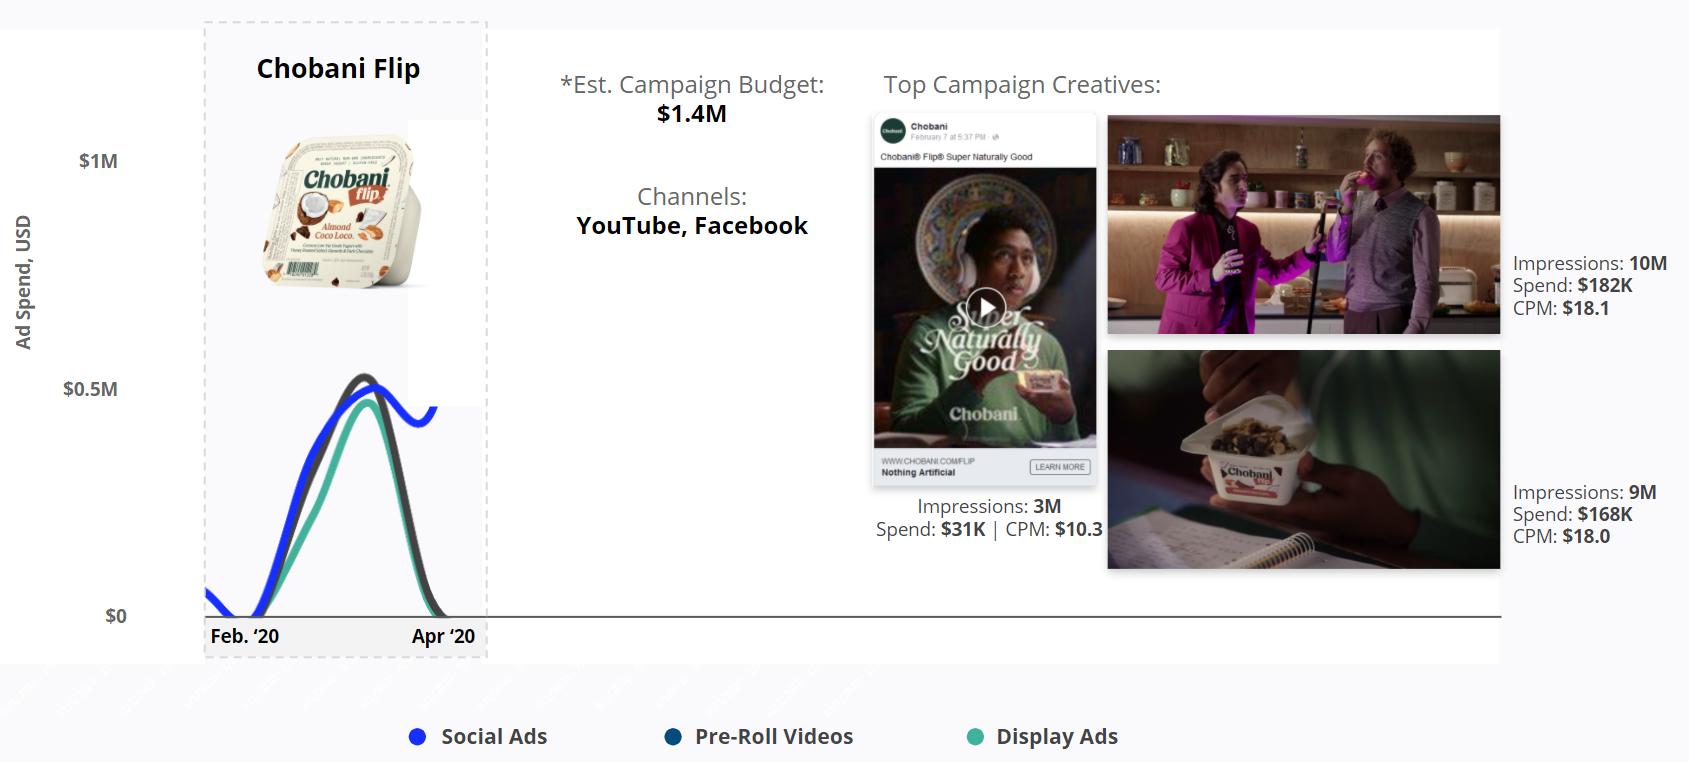 Chobani Flip - Top Campaign Creatives